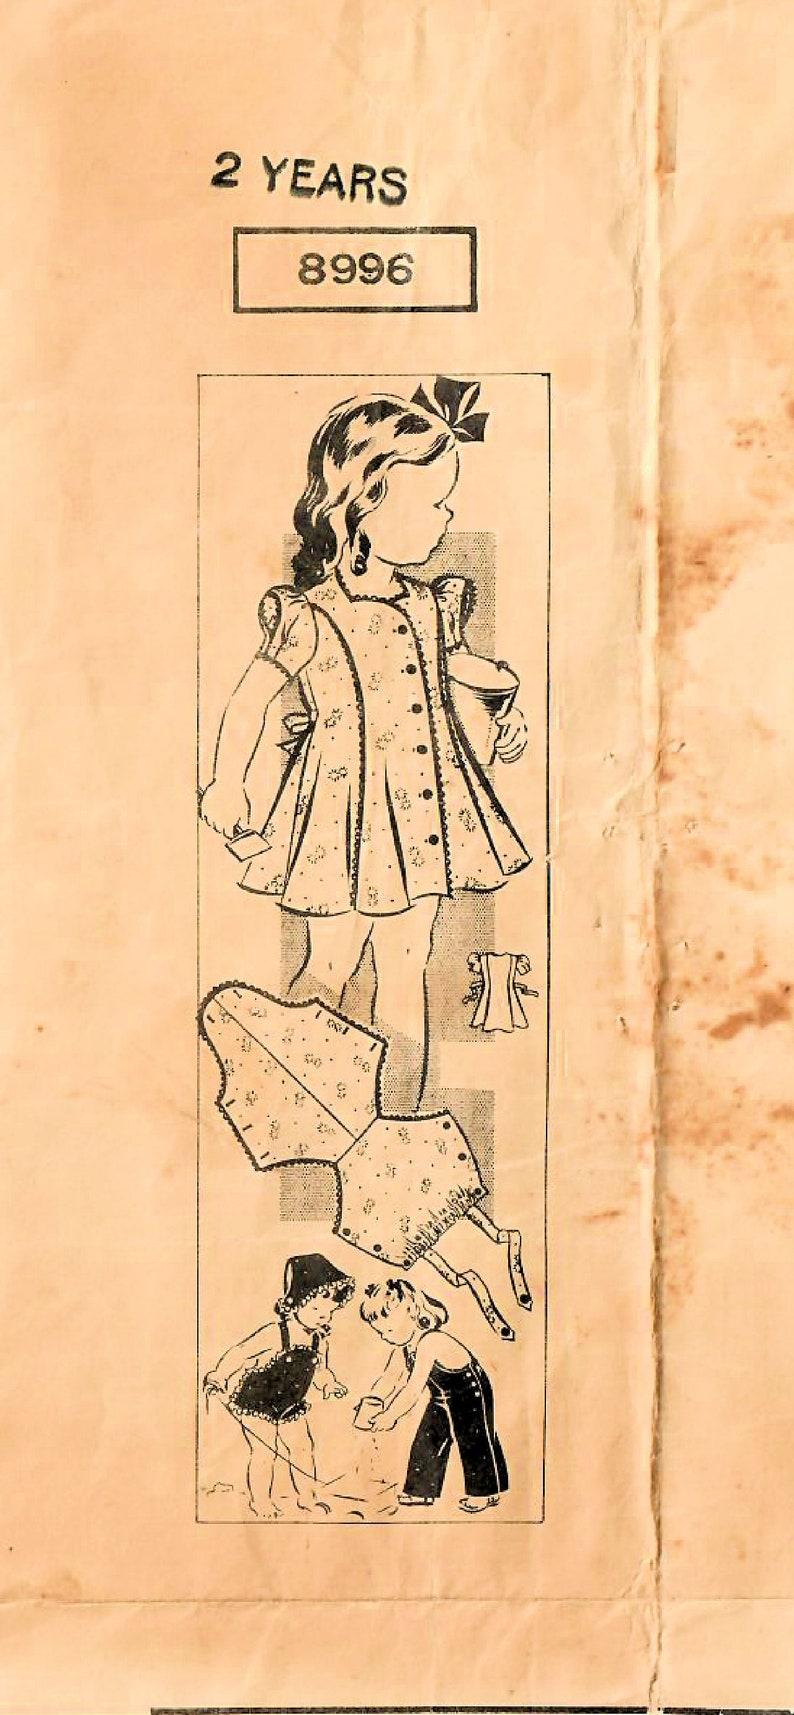 1940s Mail Order 8996 Vintage Sewing Pattern Girls Princess image 0